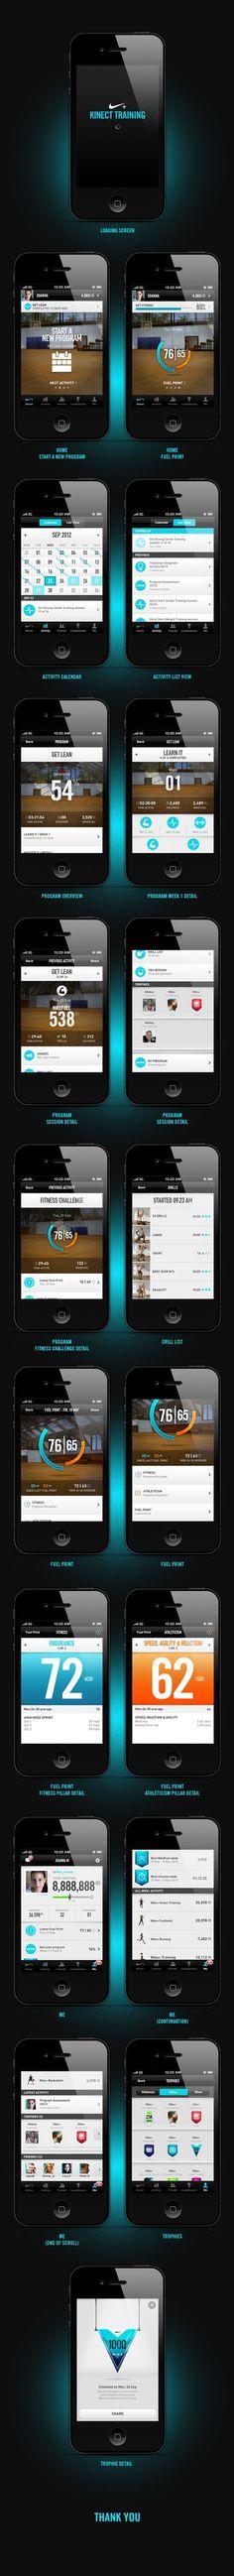 Nike+ Kinect Training (iphone app) on Behance